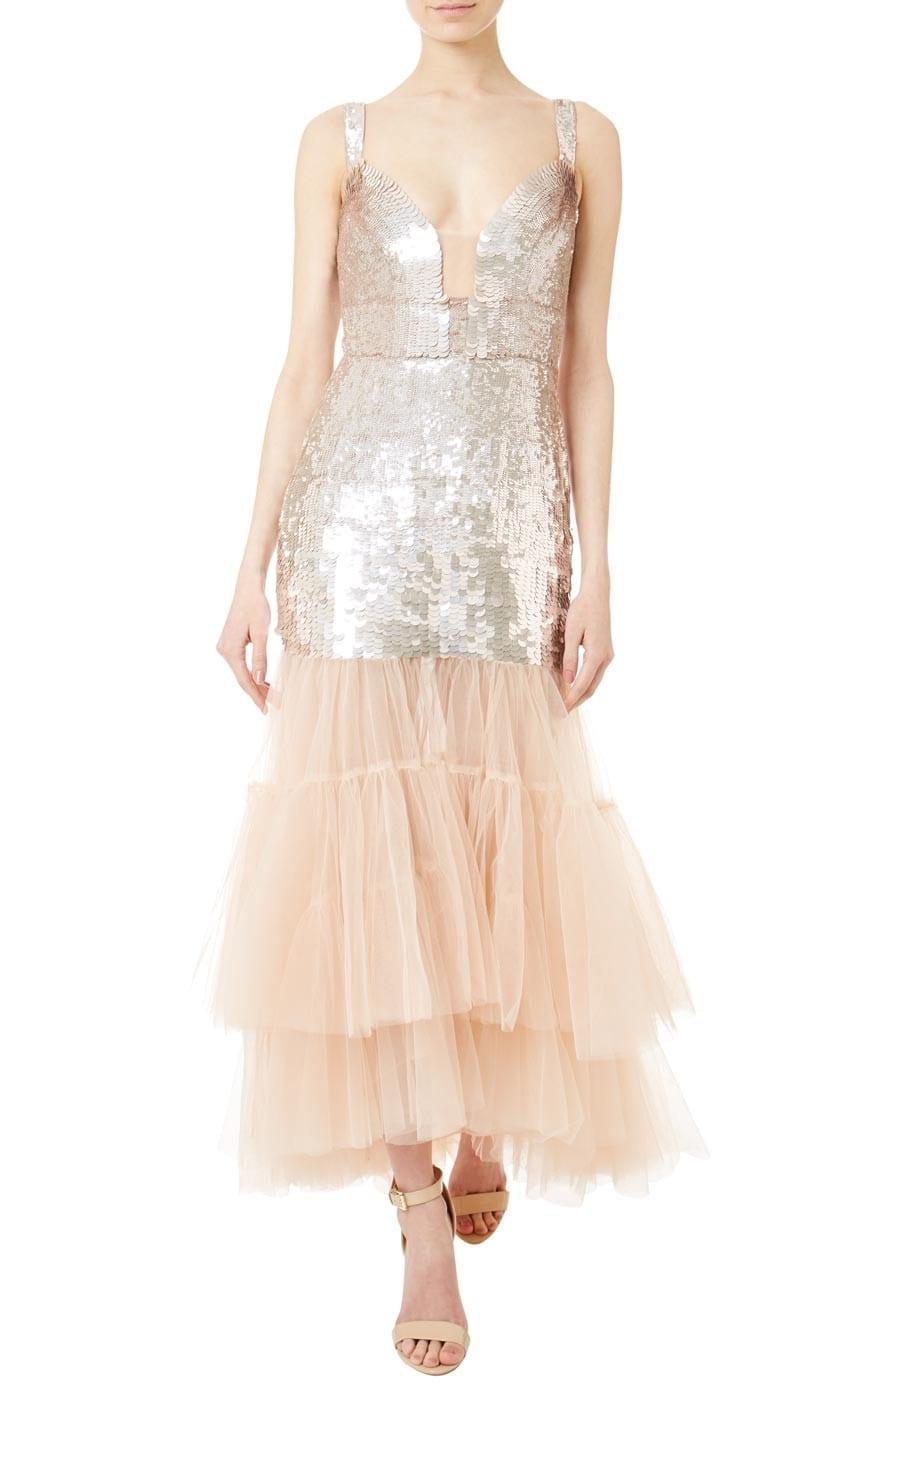 6ce5a5f6d16e TEMPERLEY LONDON Bardot Midi Procelain Dress - We Select Dresses